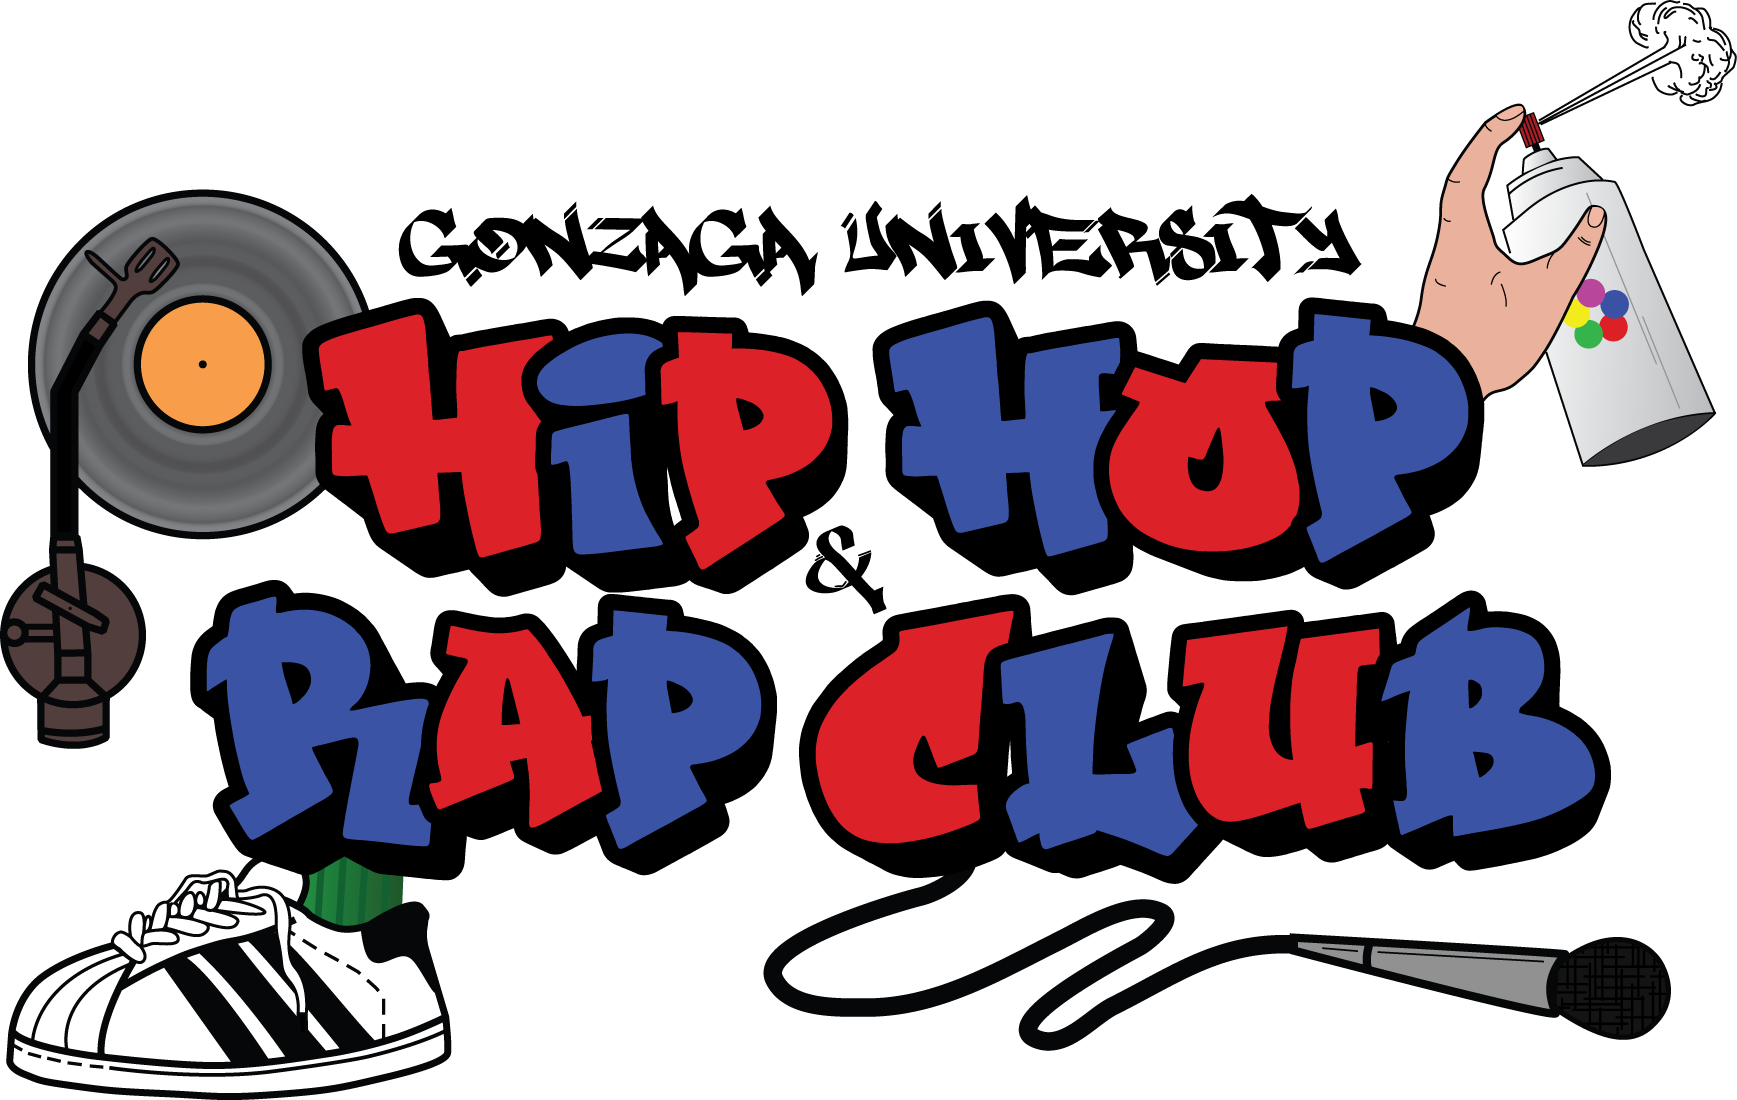 GUHipHopRapClub.png